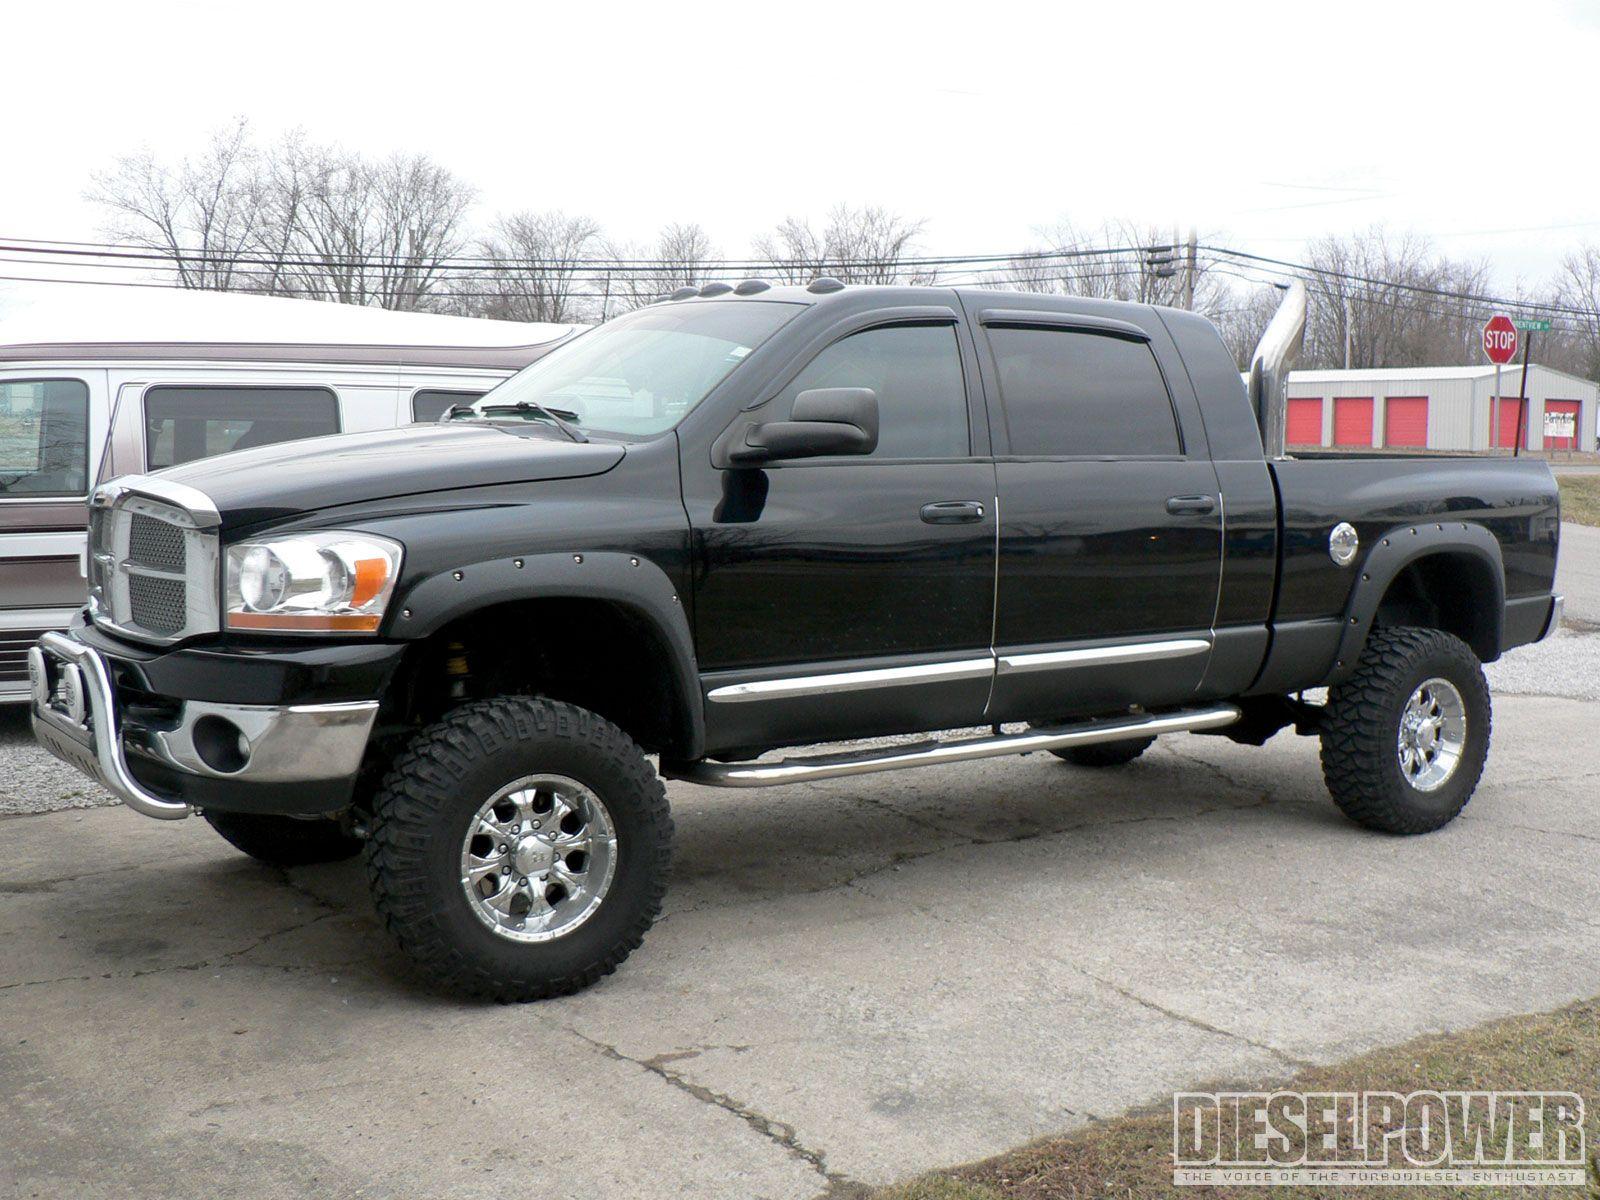 black lifted dodge ram 2500 truck Lifted Trucks